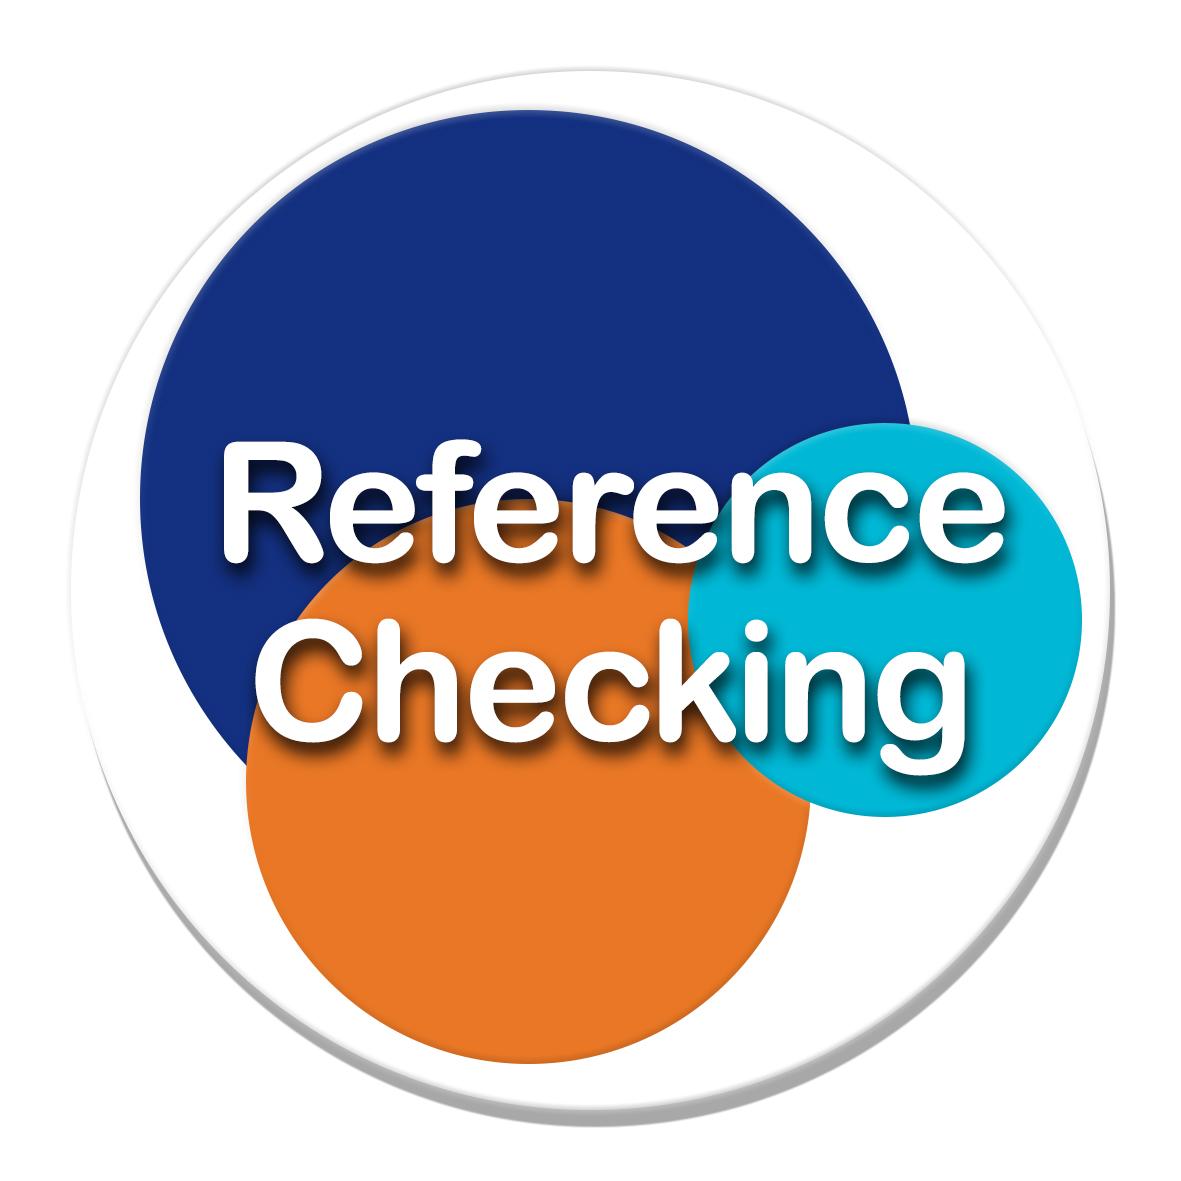 Raising awareness through best practice for better reference checks